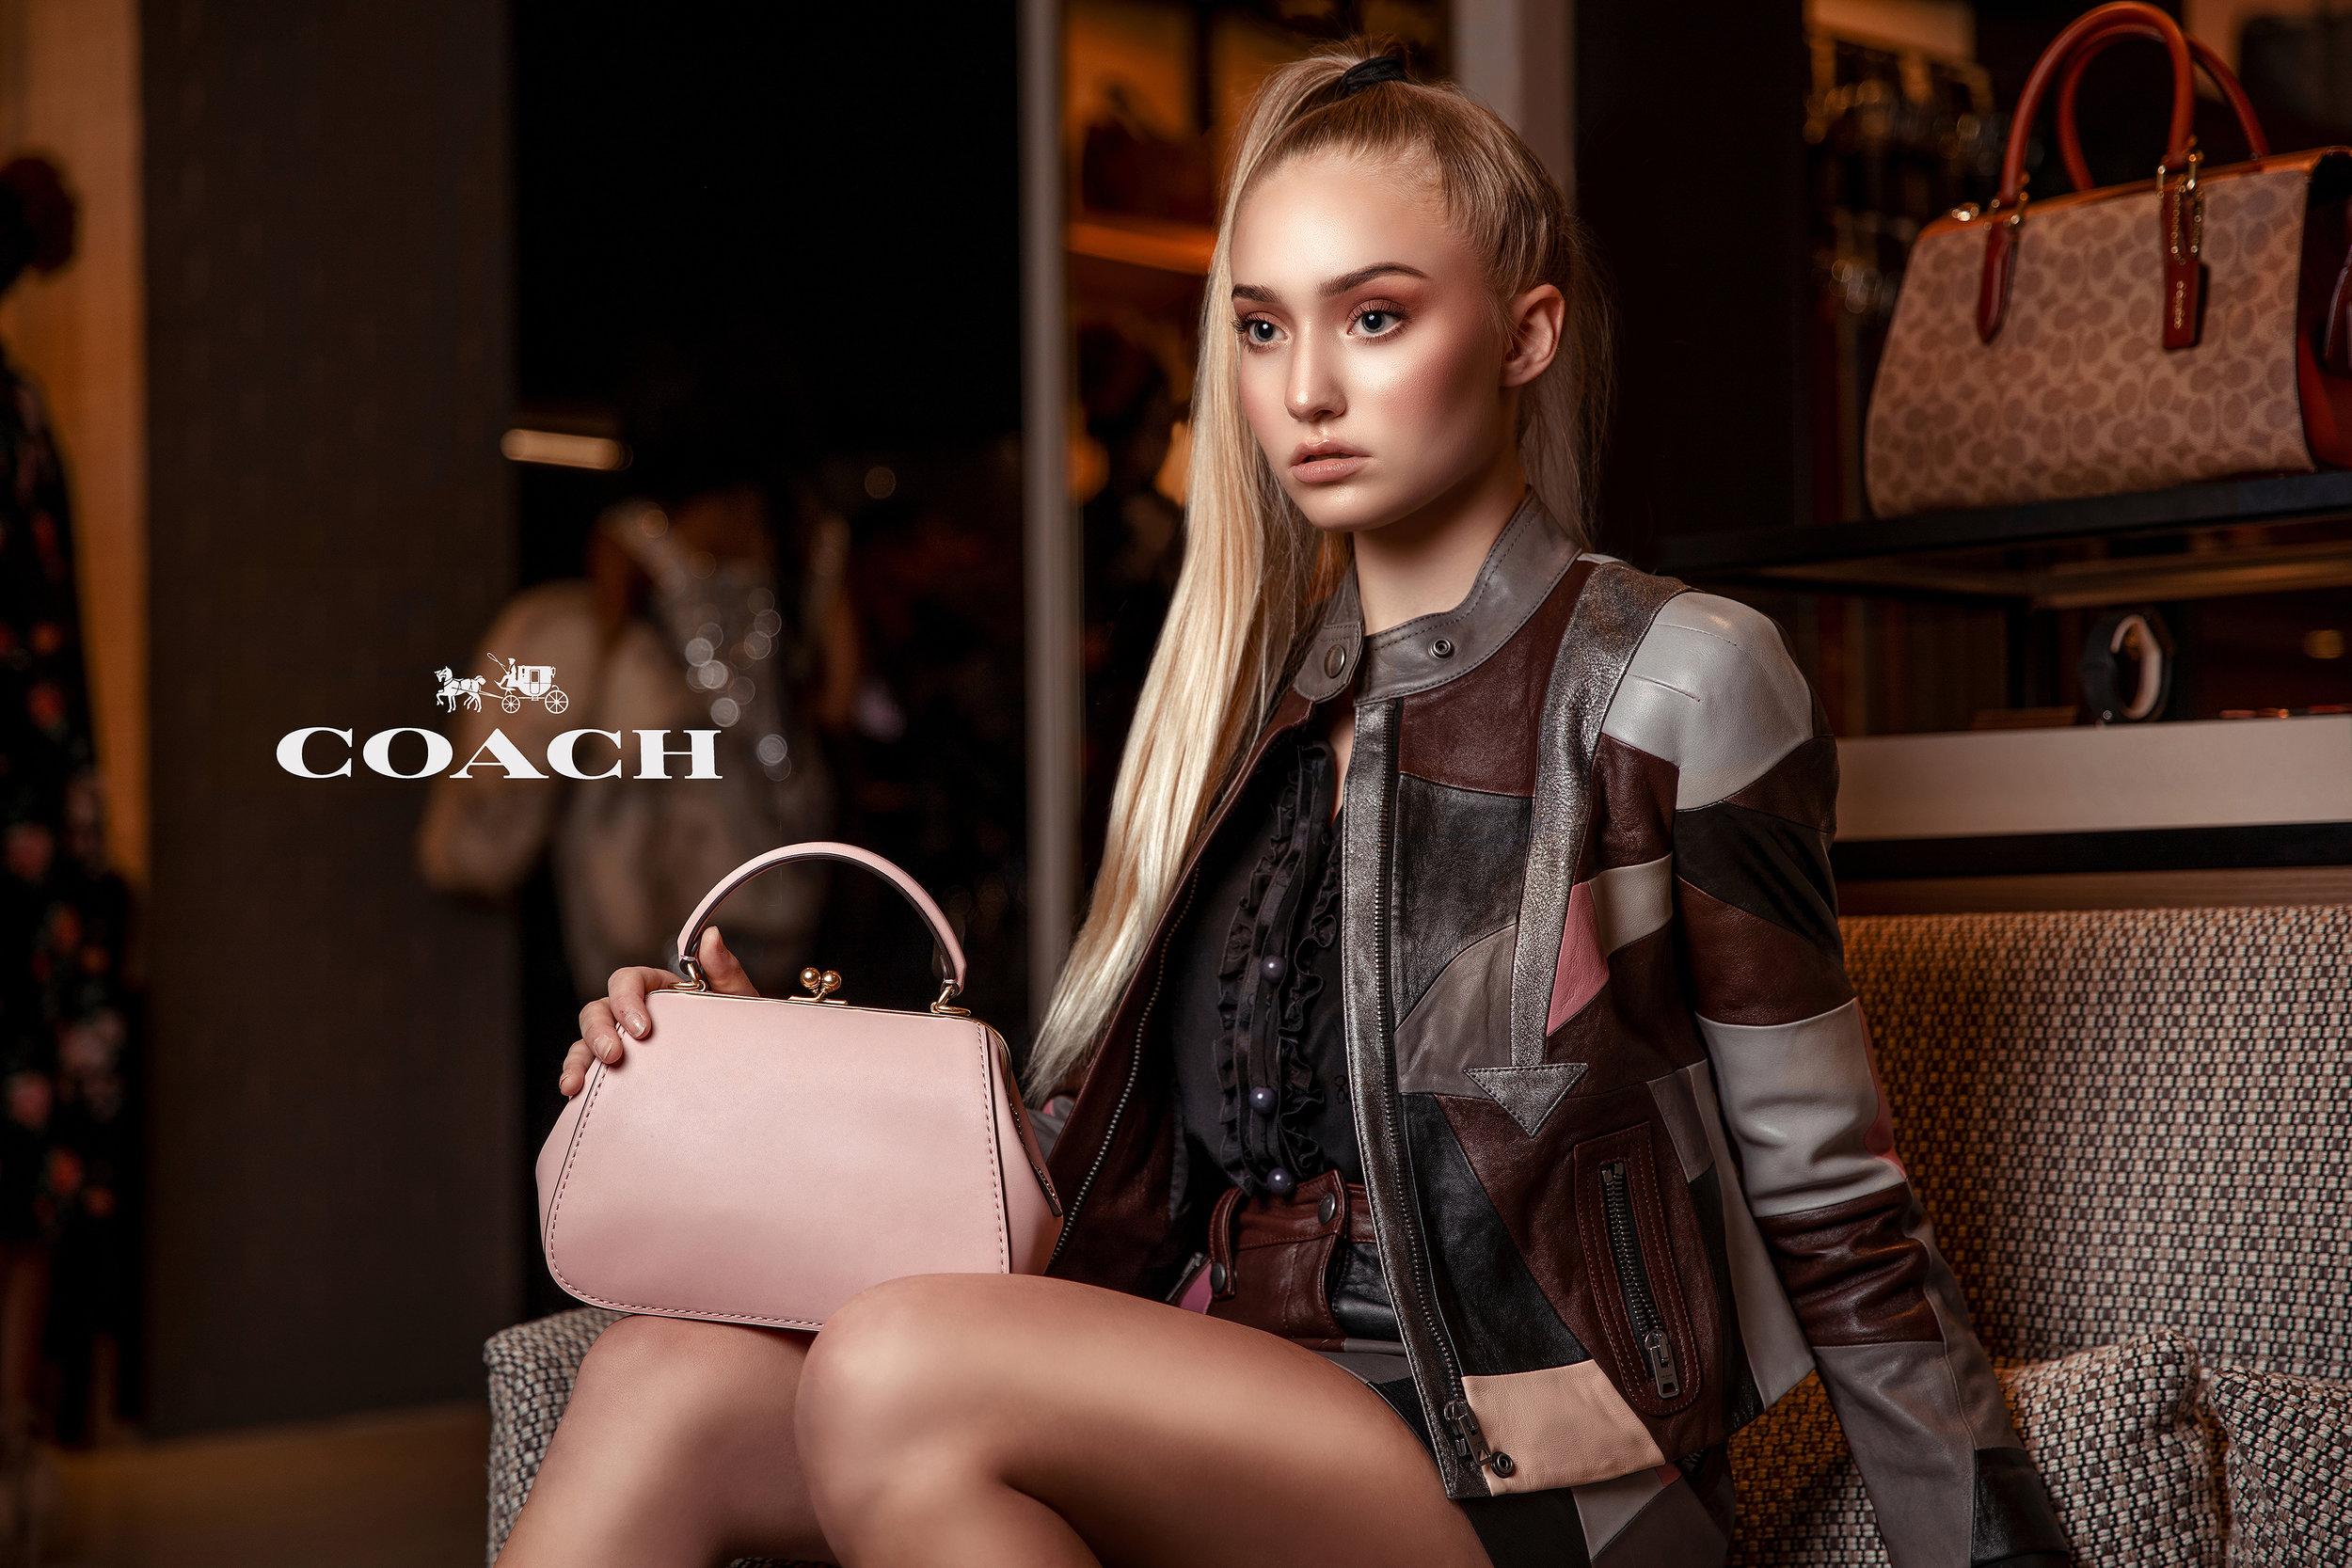 coach-fashion-editorial-trunk-show-photoshoot.jpg